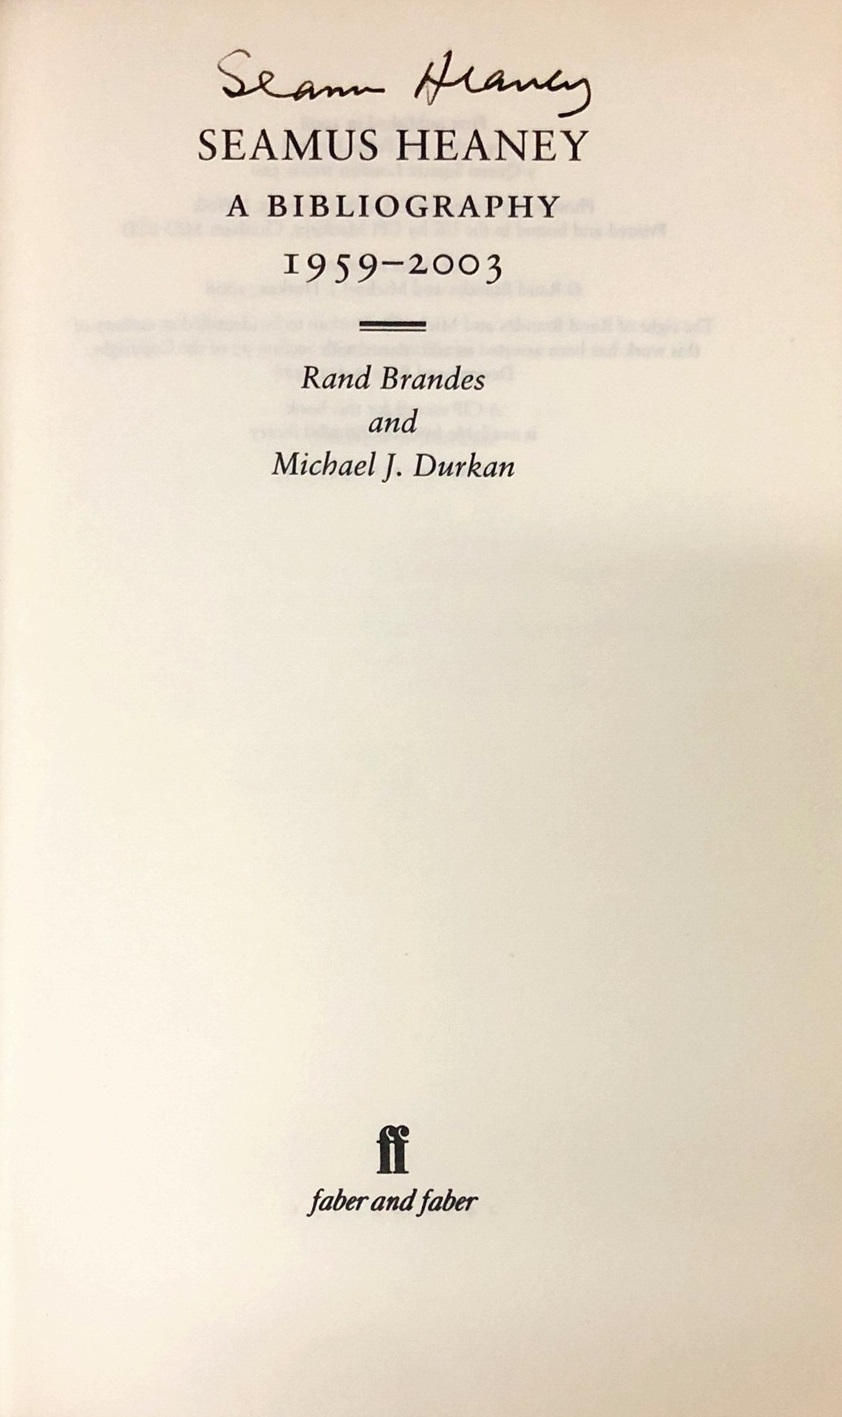 Lot 30 - Both Signed Copies [Seamus Heaney] Brandes (R.) & Durkan (M.J.